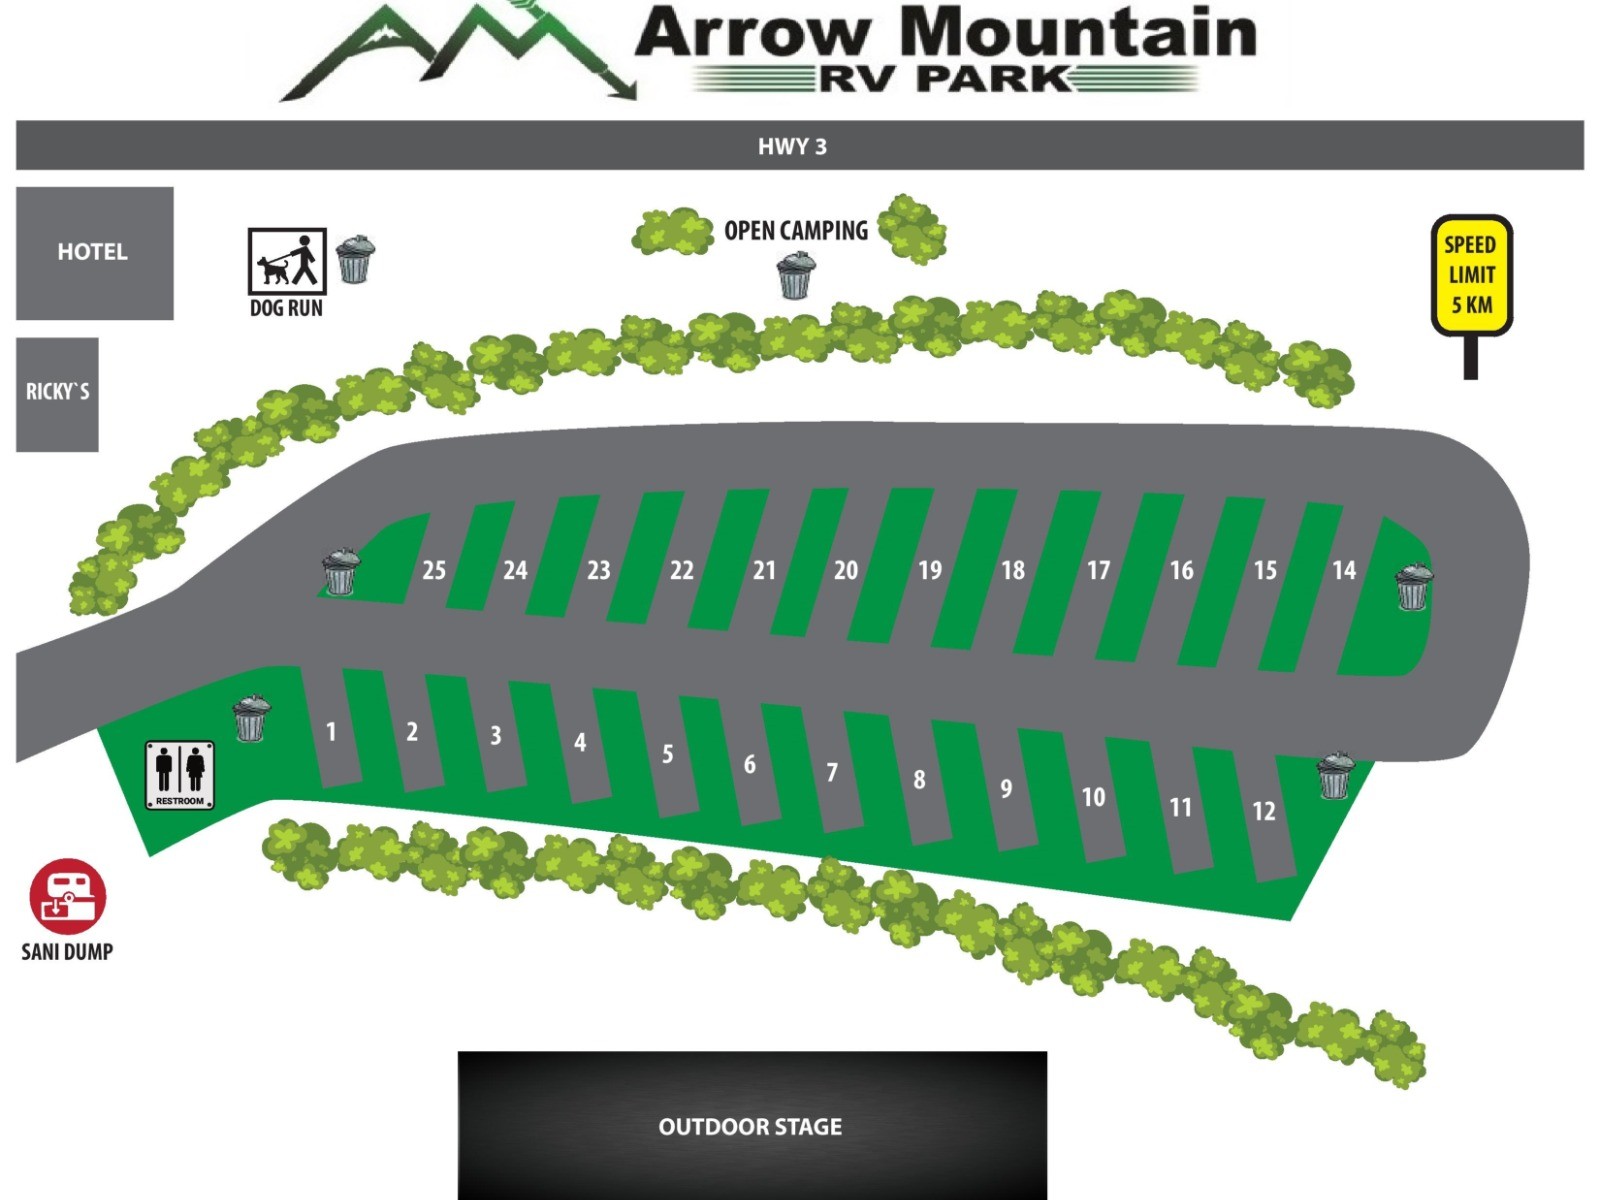 Arrow Mountain RV Park